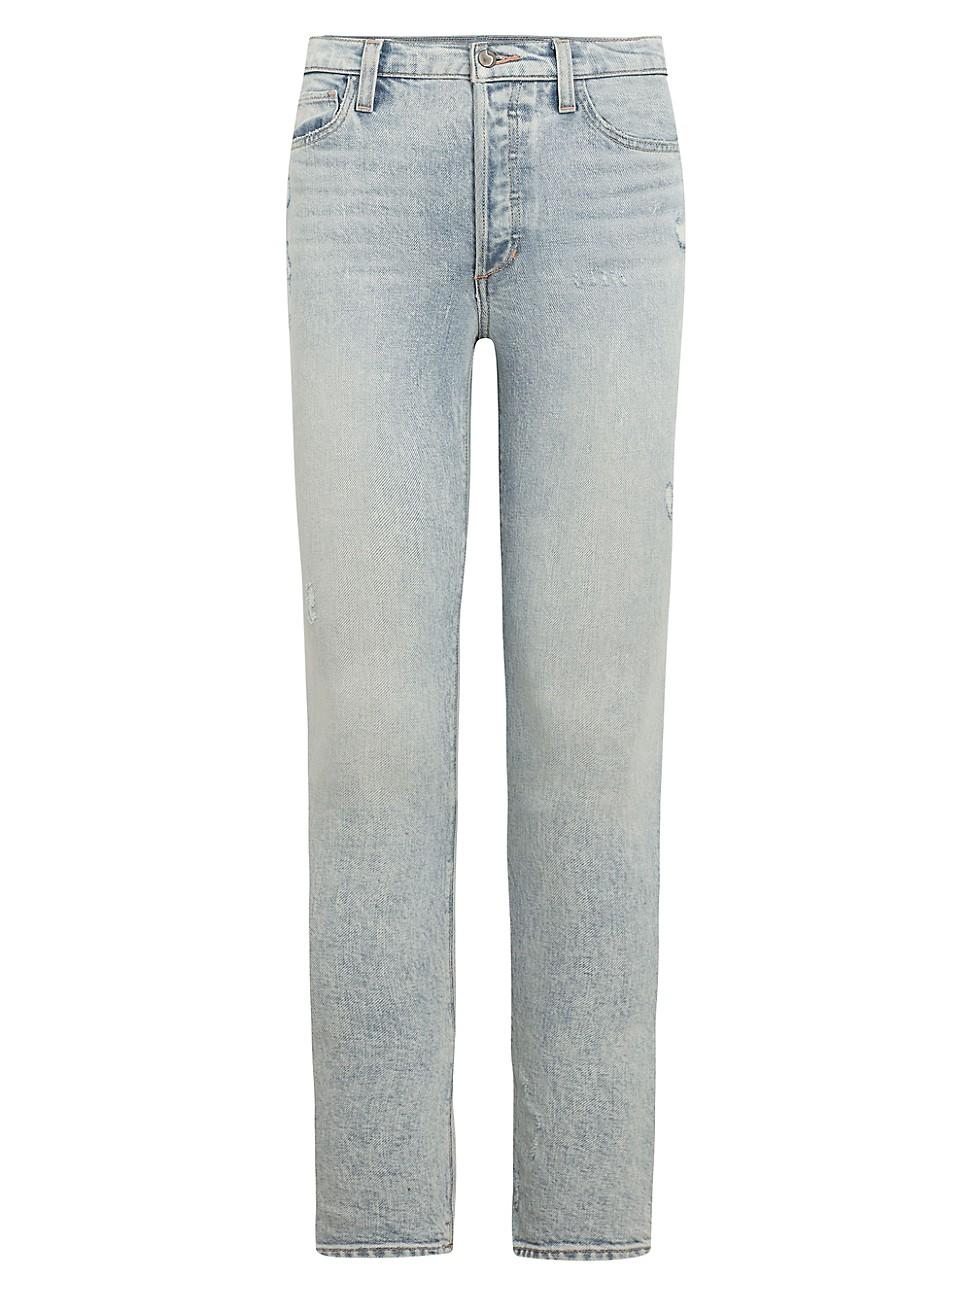 Joe's Jeans WOMEN'S THE SCOUT STRAIGHT JEANS